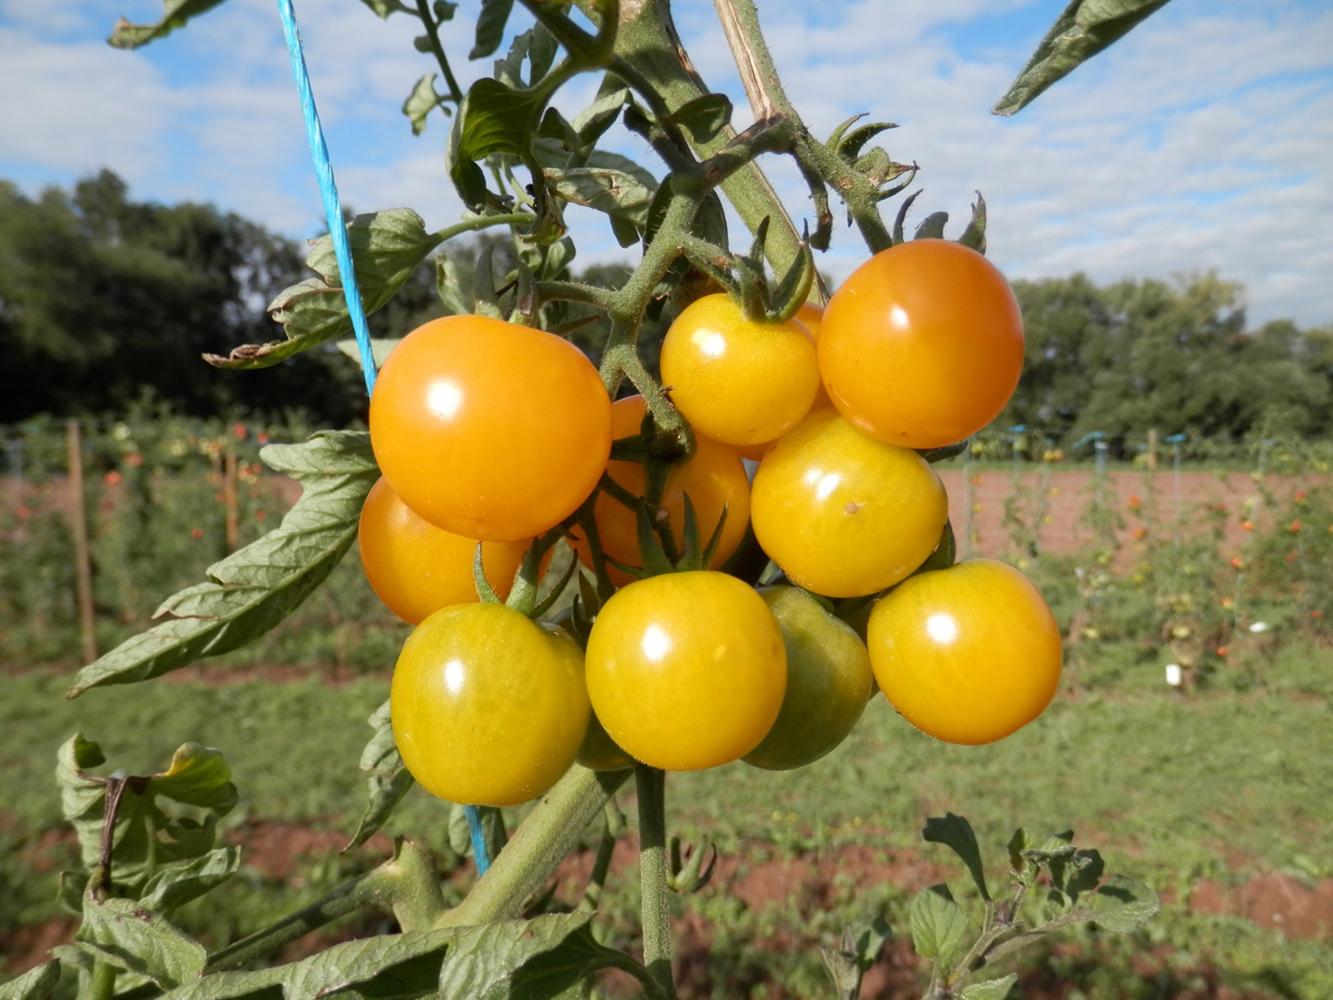 Tomatoes of the Sunviva variety at the University of Göttingen.